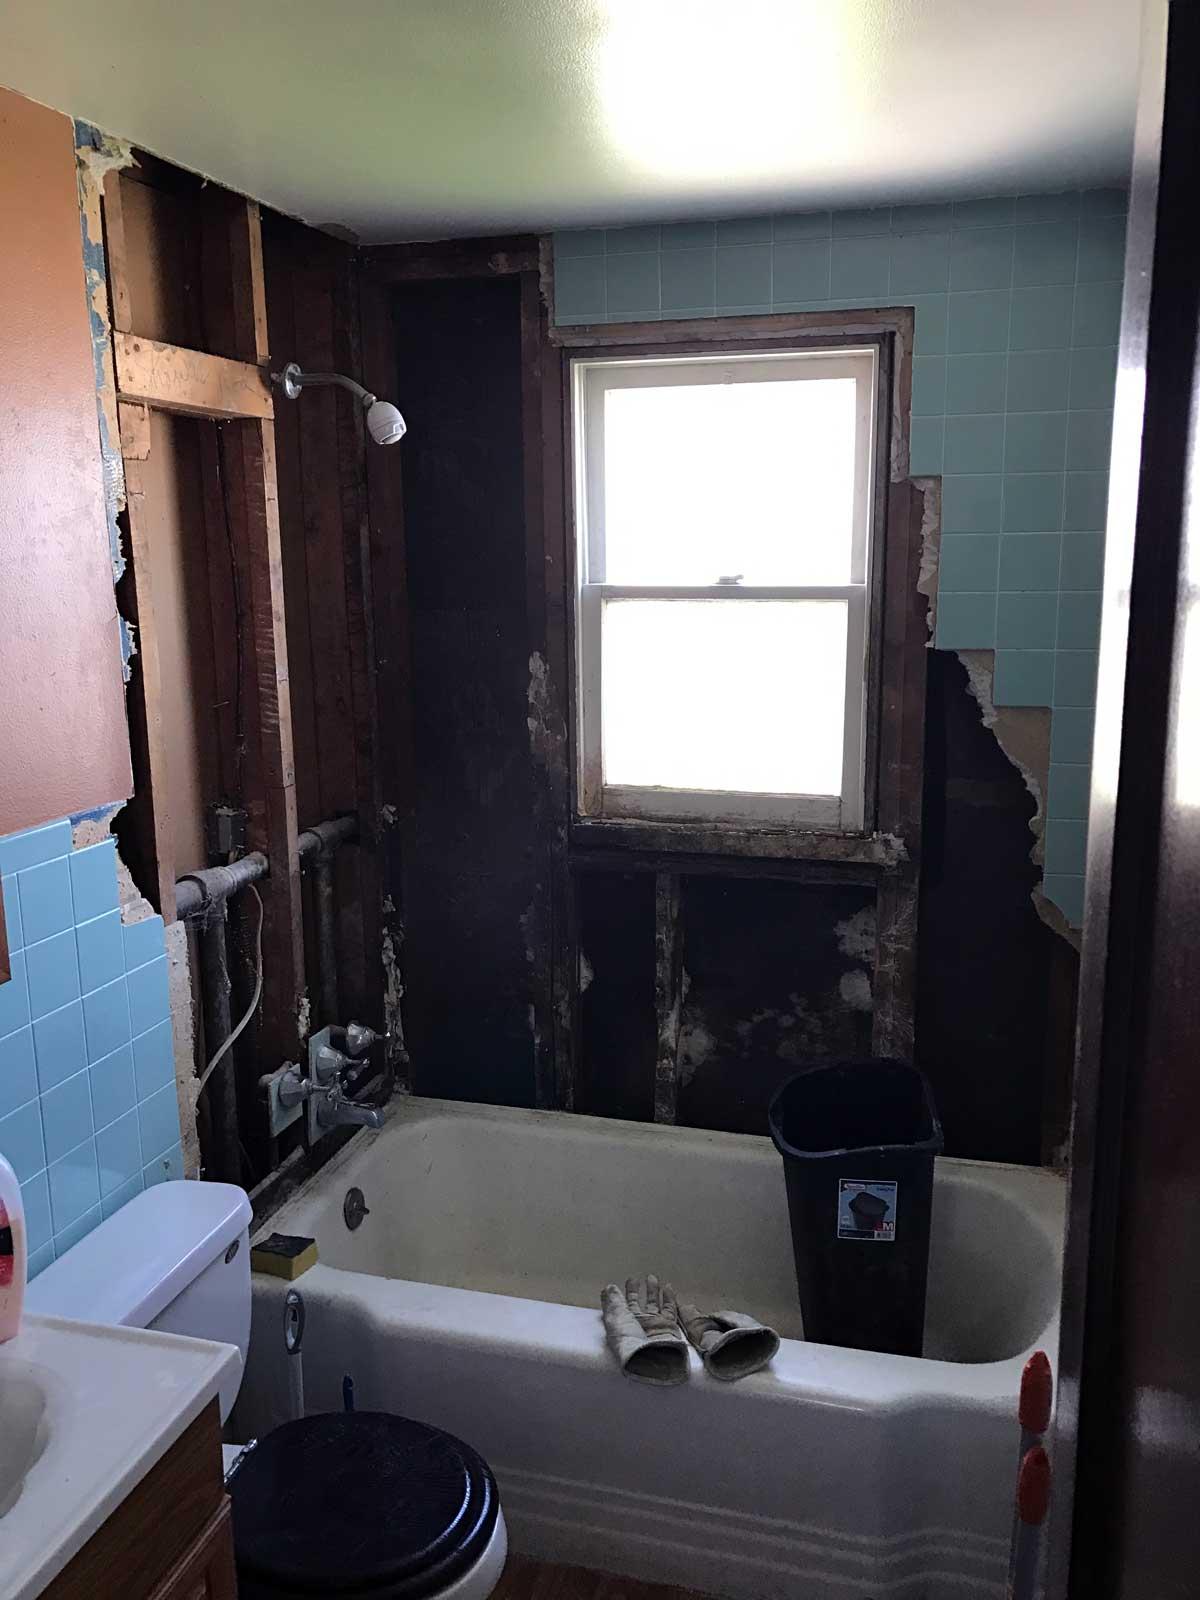 Planning My Bathroom Renovation Project Journey Of An Architect - Starting a bathroom renovation